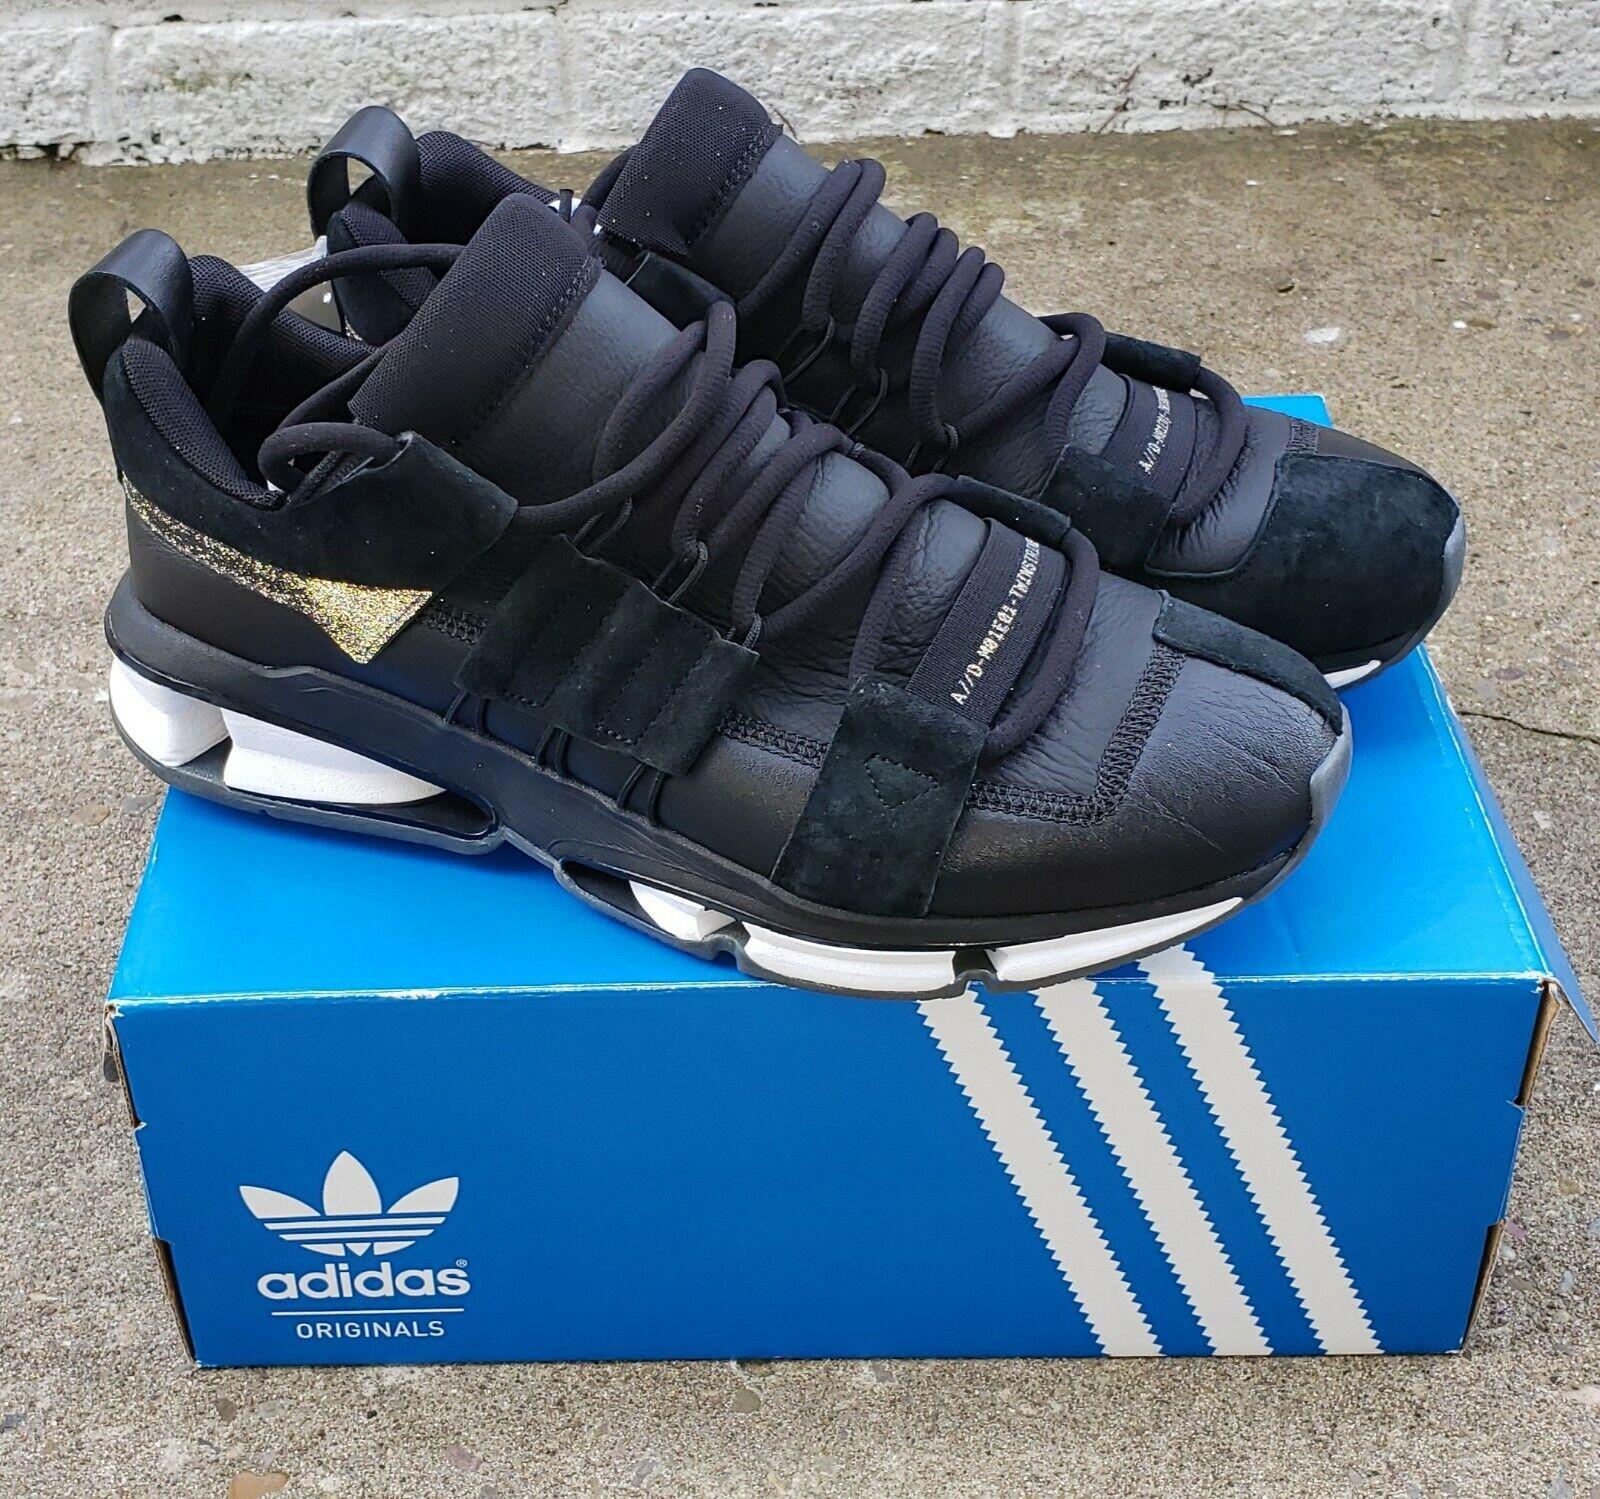 Adidas Originals Mens Twinstrike ADV Stretch Leather shoes Sz 10 B28015